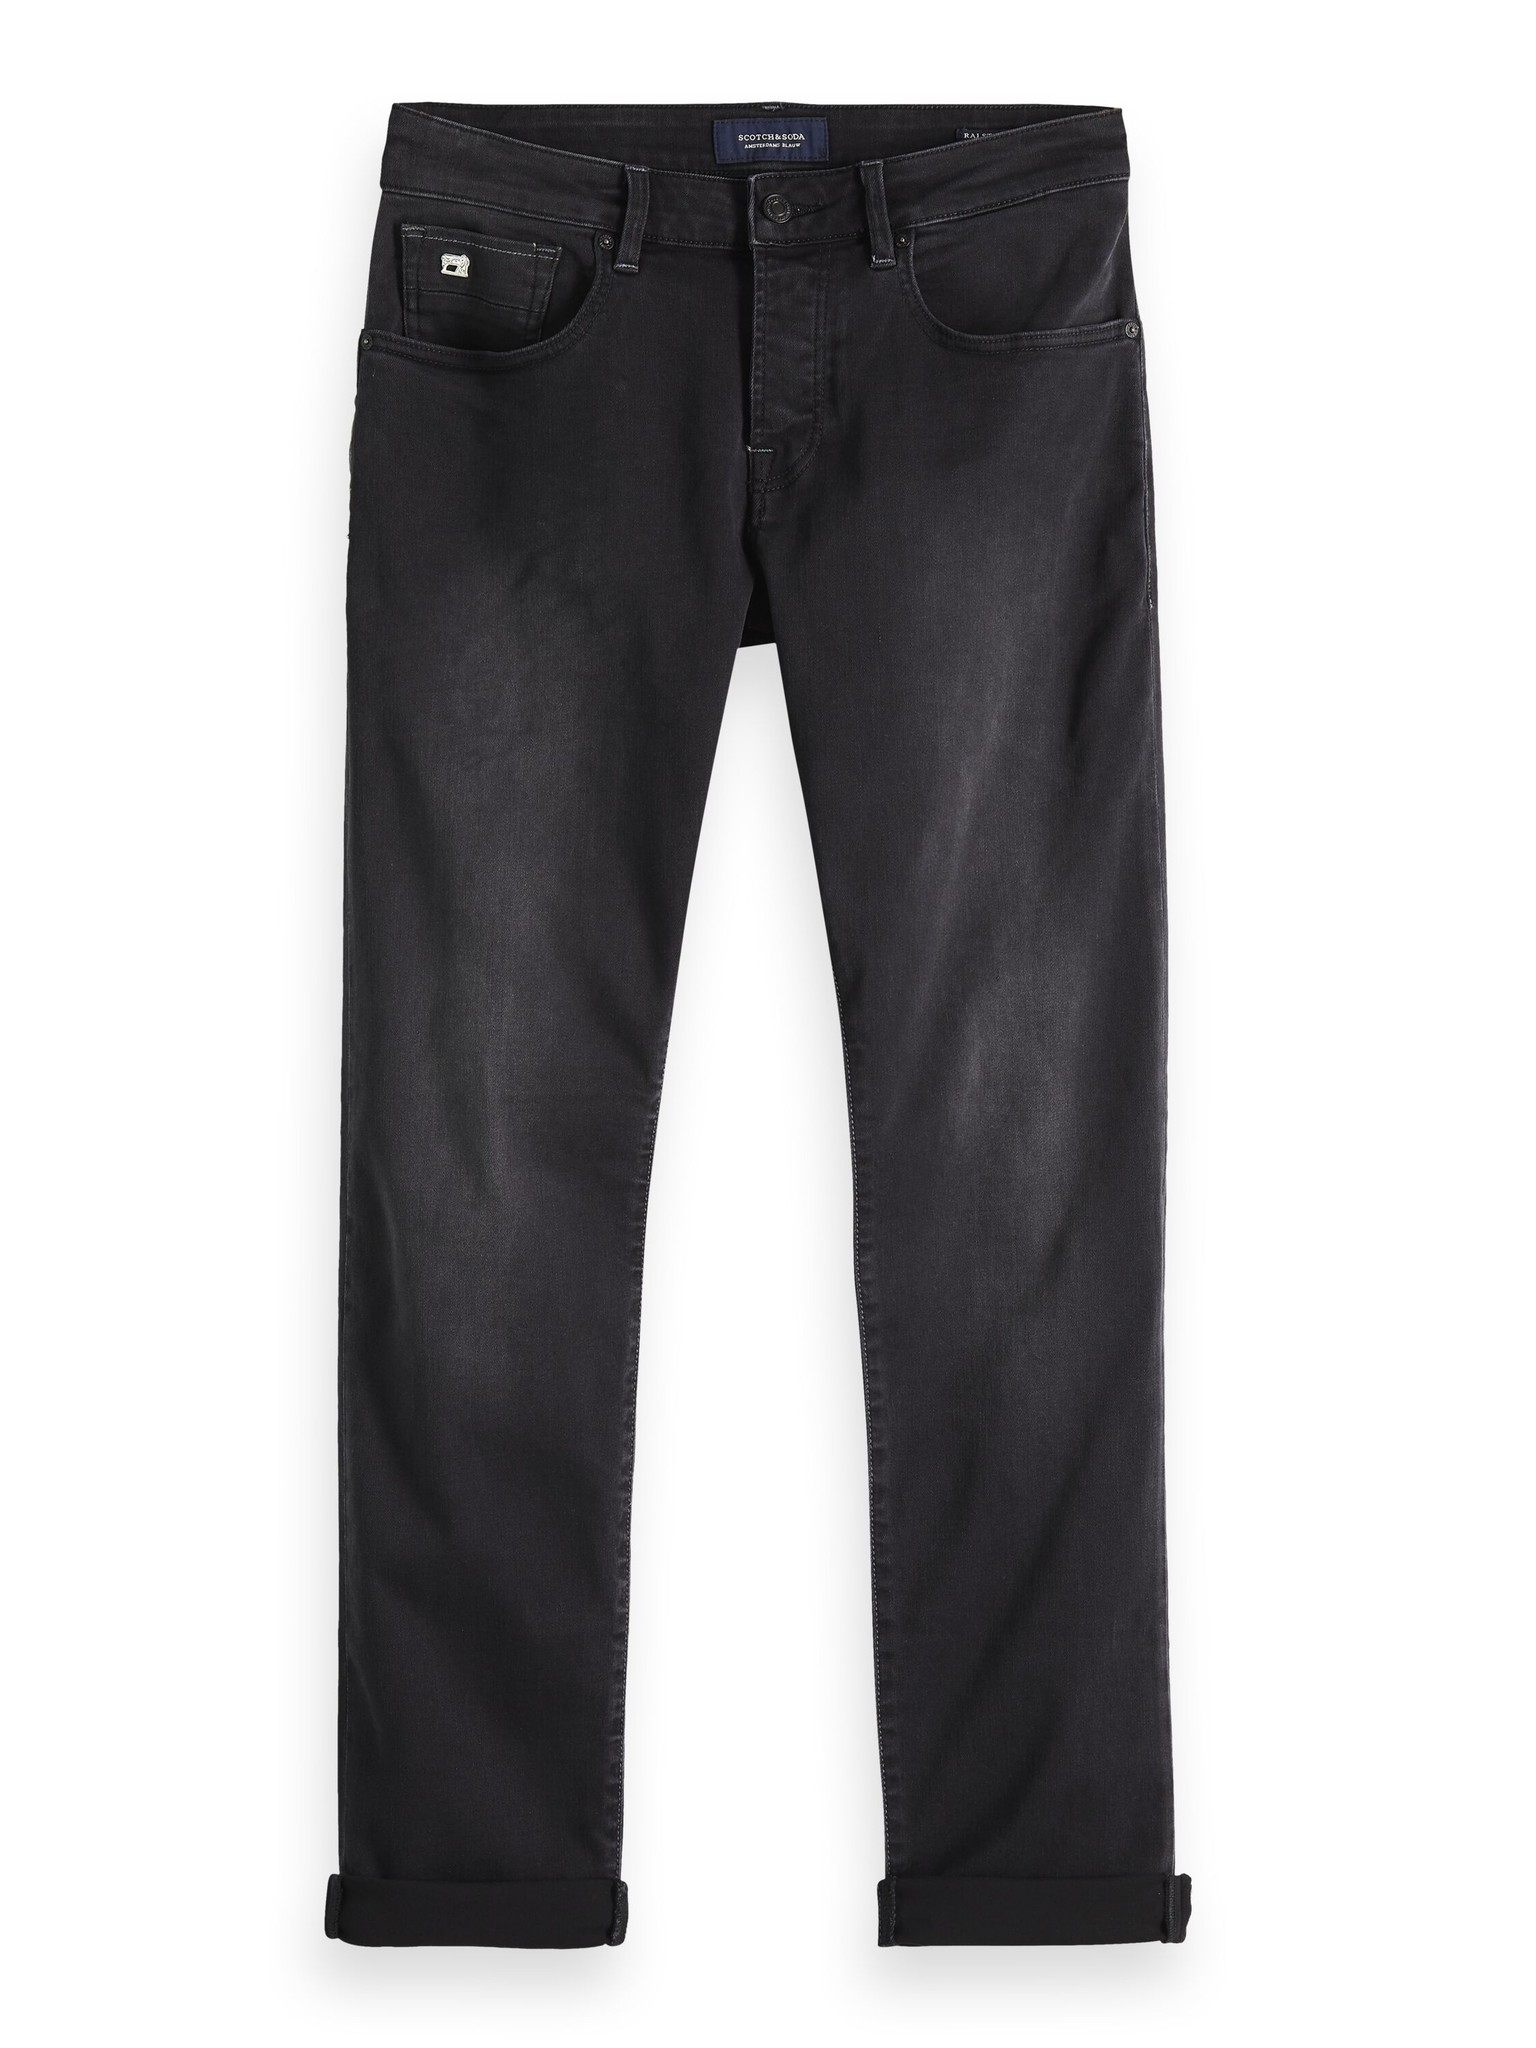 Scotch & Soda Ralston Freerun Black Jeans   150963